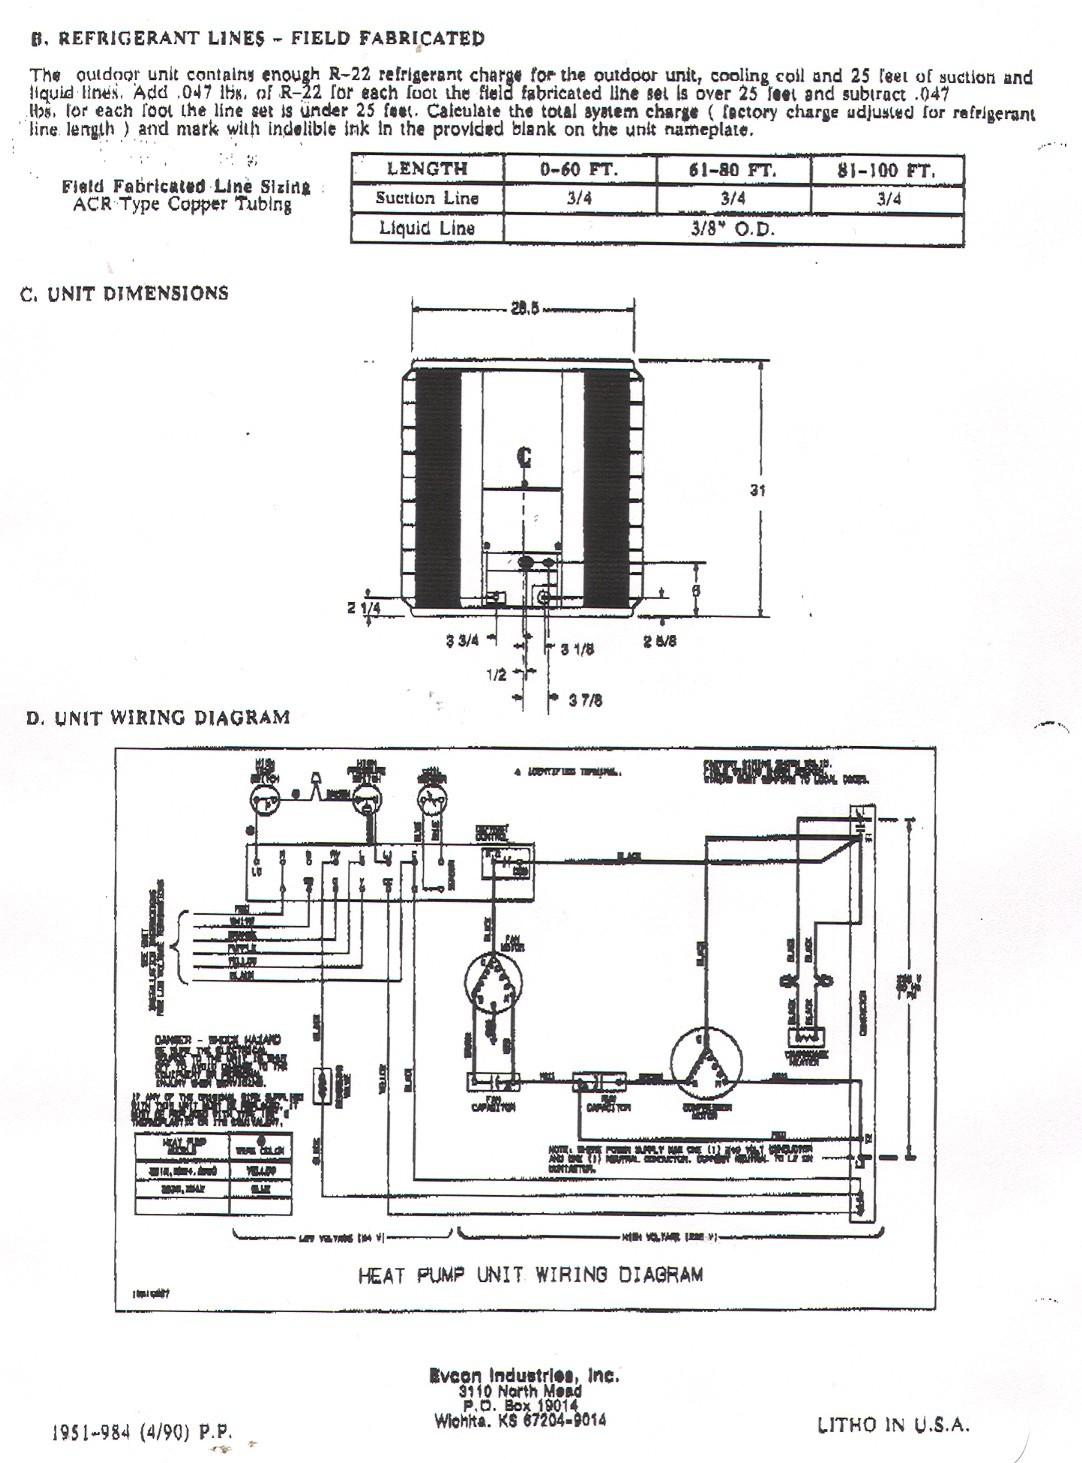 york heat pump thermostat wiring diagram Download York Heat Pump Wiring Diagram 12 a DOWNLOAD Wiring Diagram